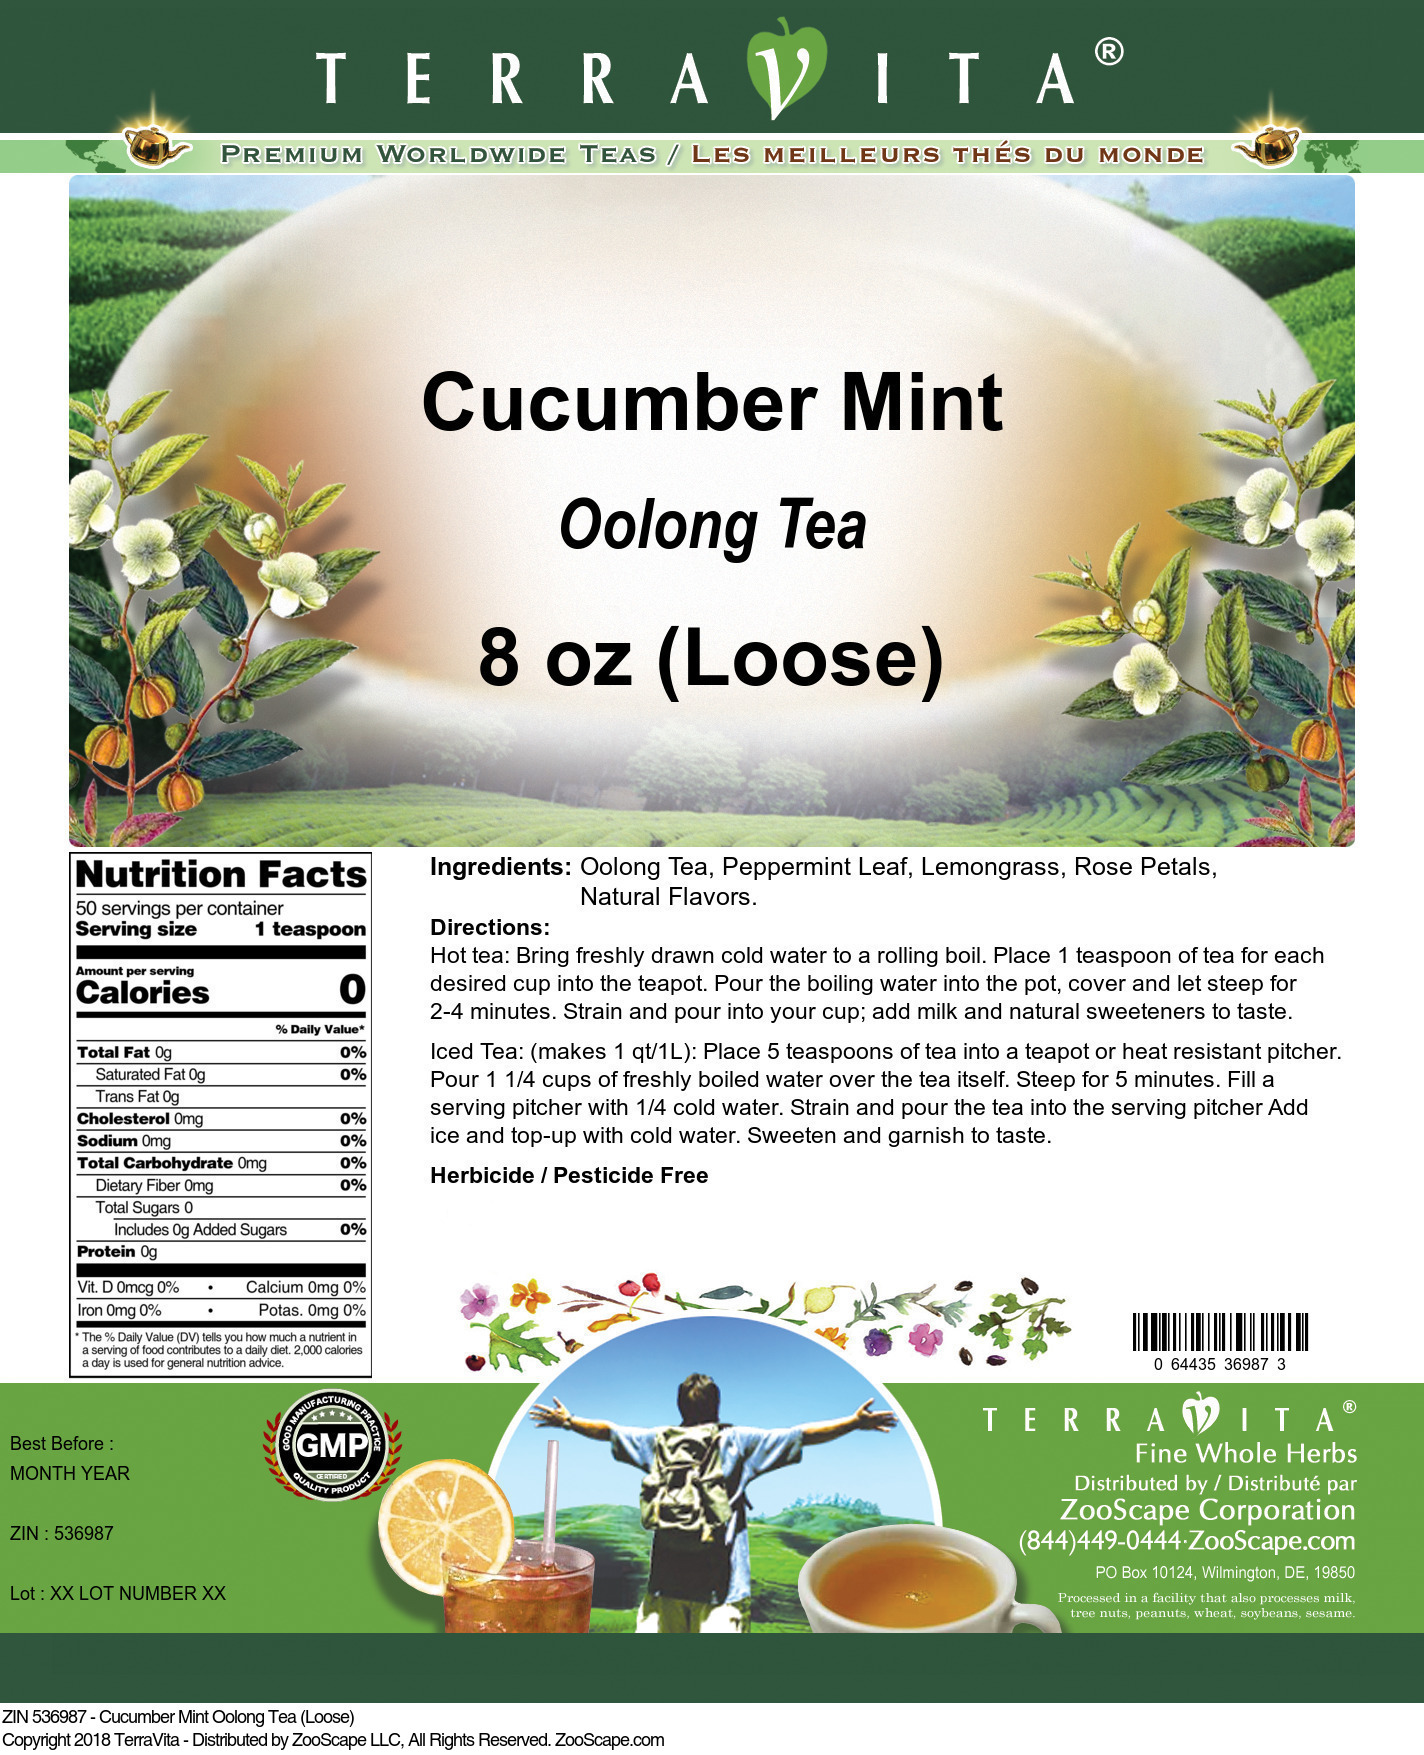 Cucumber Mint Oolong Tea